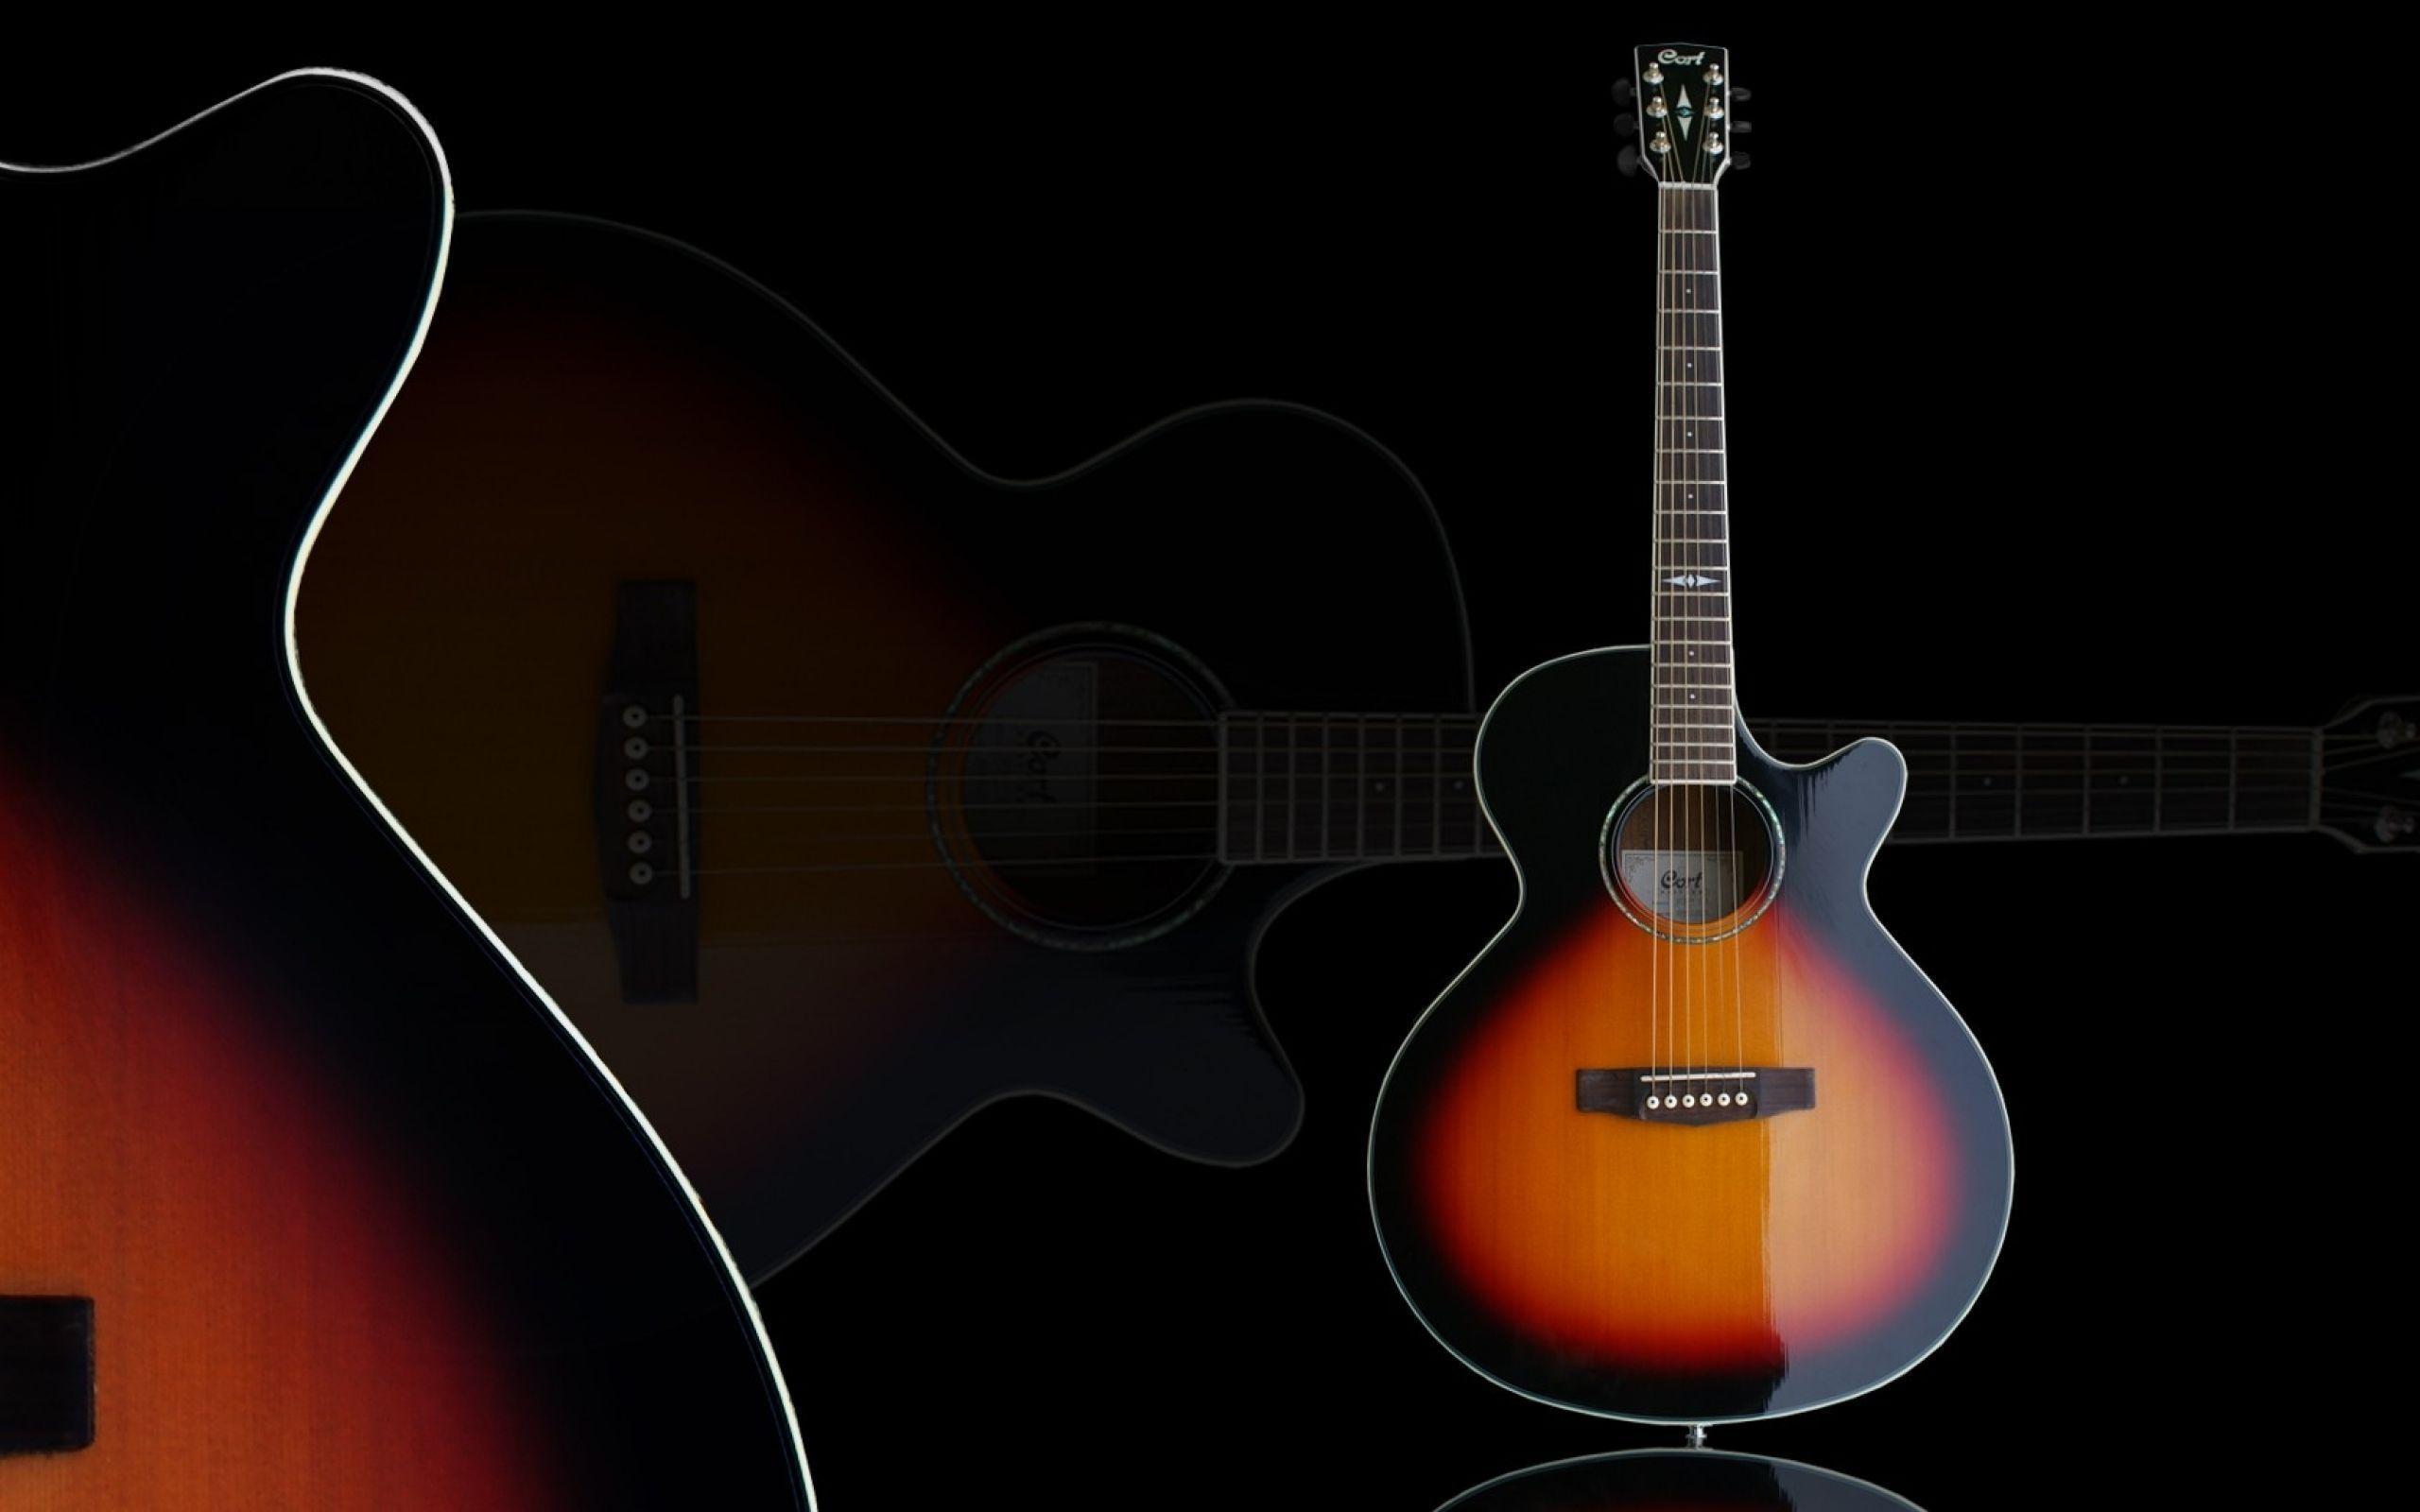 guitar wallpaper widescreen - photo #32